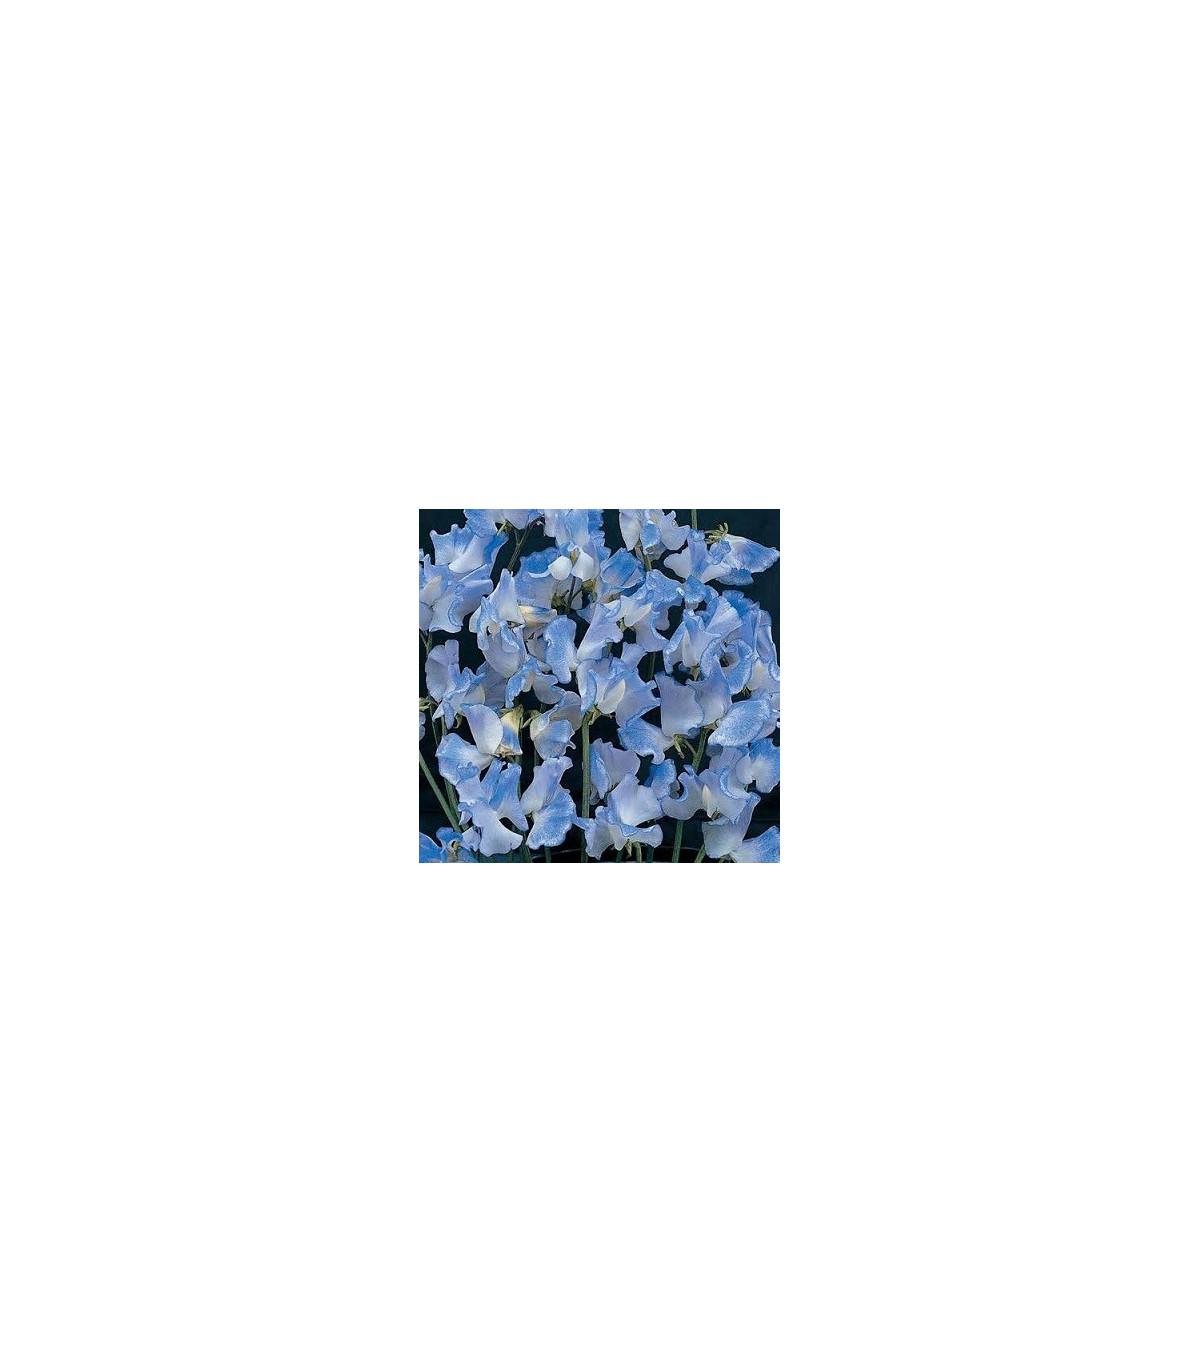 Hrachor pnoucí modrý - semena Hrachoru - Lathyrus odoratus - 20 ks